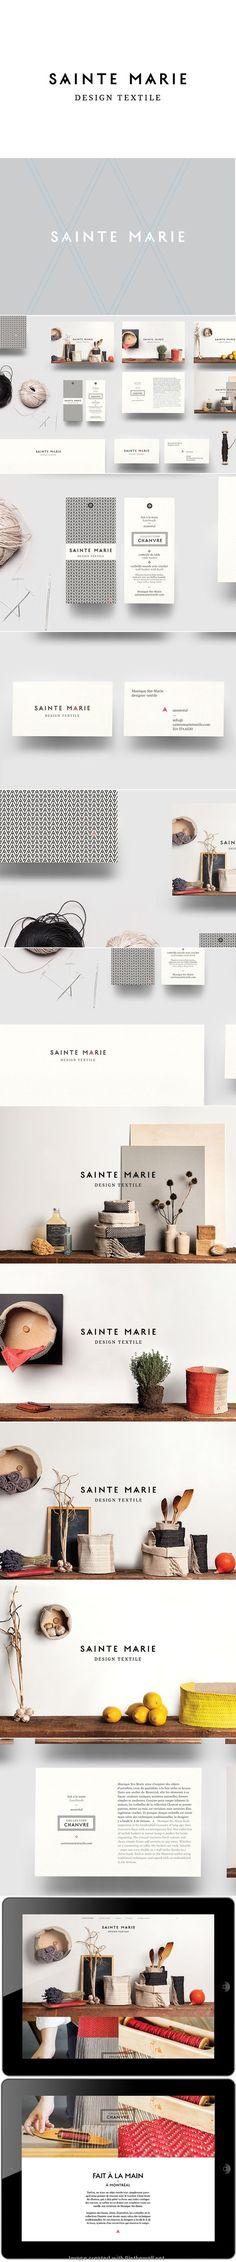 Simply beautiful. Sainte marie corporate identity branding graphic textile design business card website label